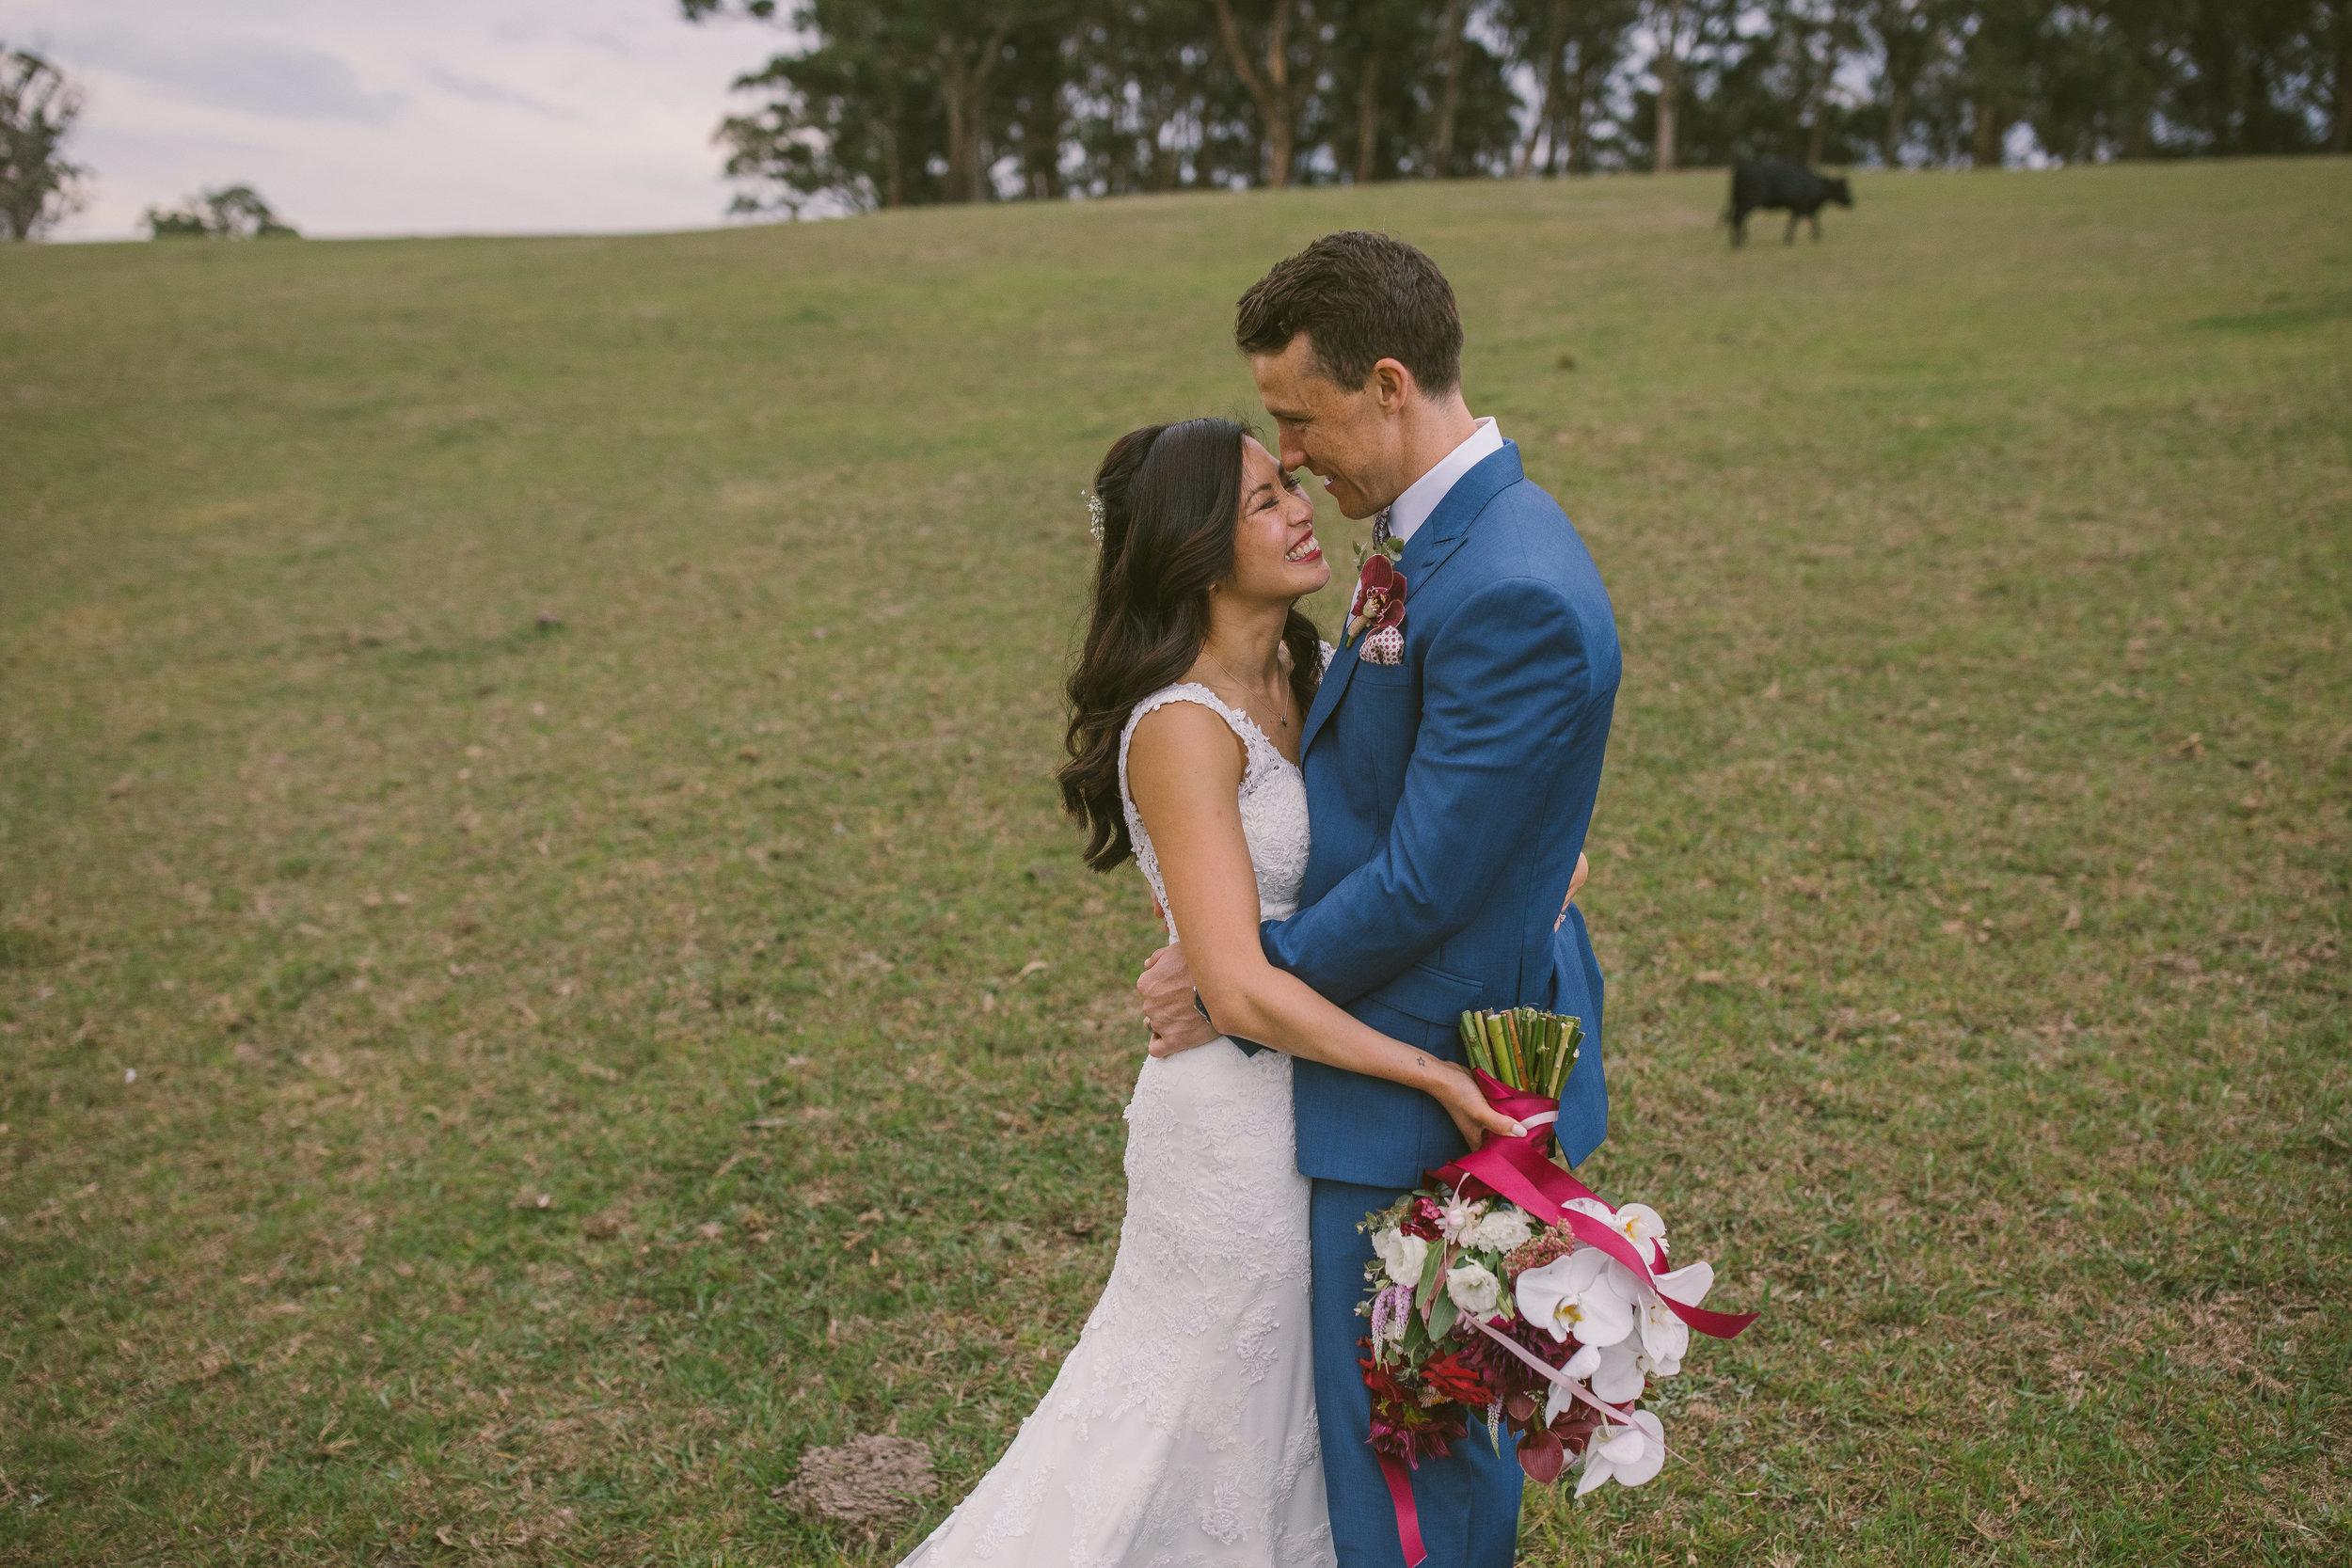 Sarah + Jason - Mali Brae Farm Wedding Photographer - Magnus Agren Photography-0543.jpg